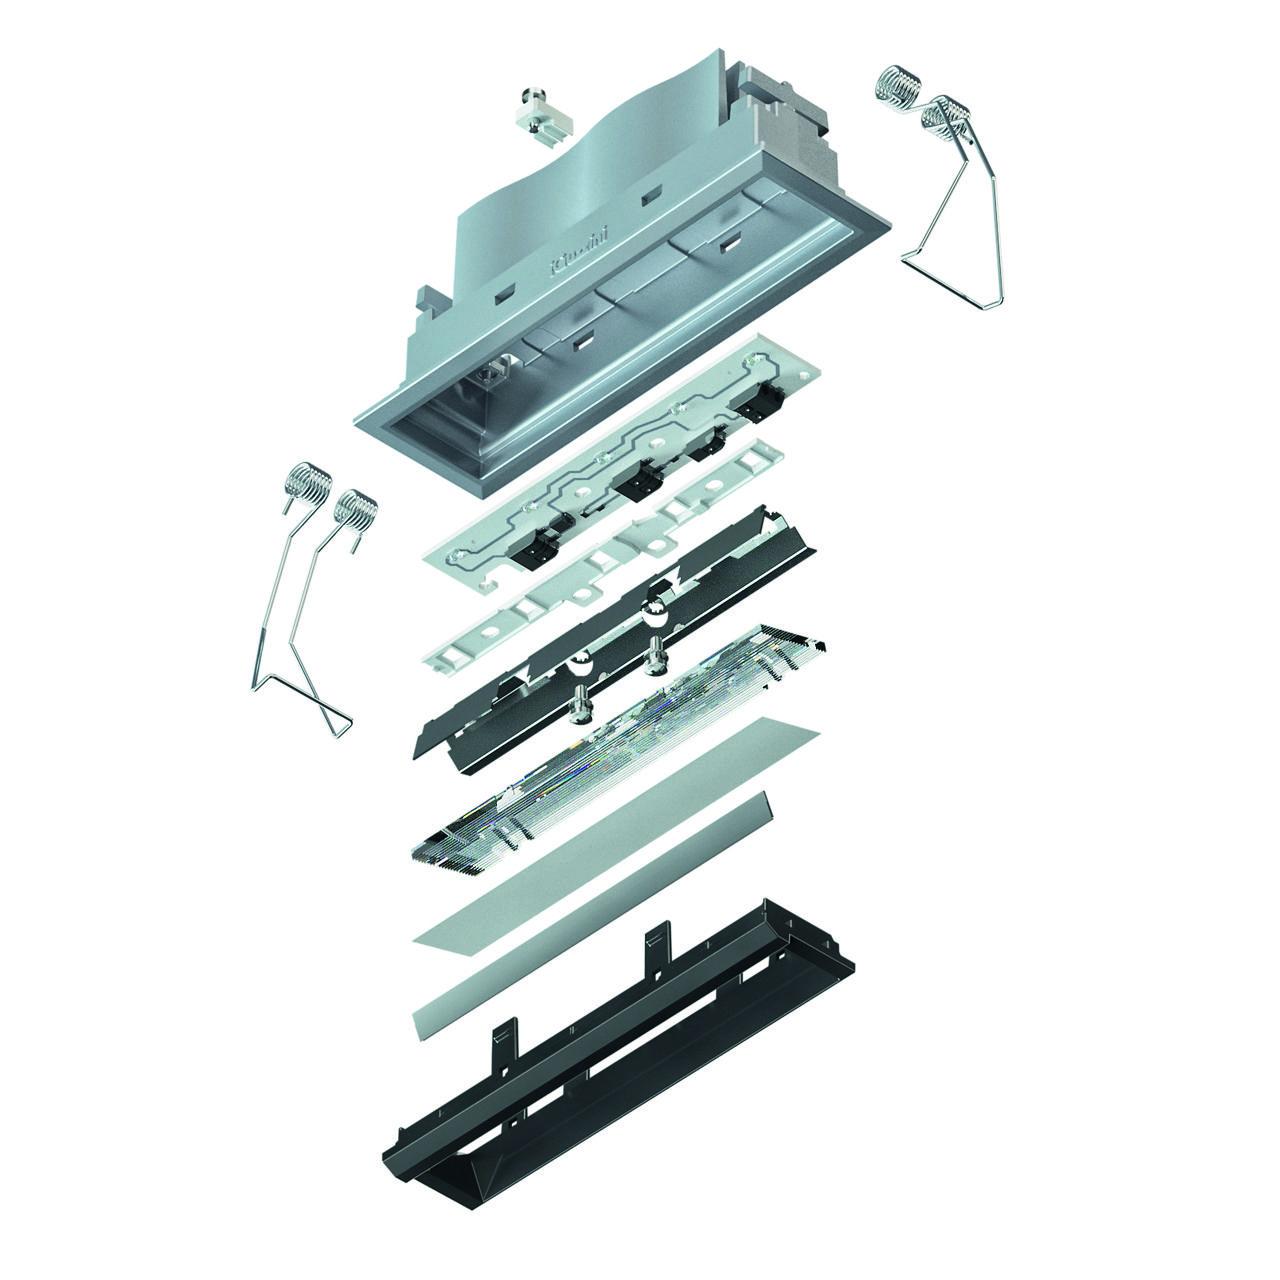 iguzzini product laser blade lighting design iguzzini. Black Bedroom Furniture Sets. Home Design Ideas